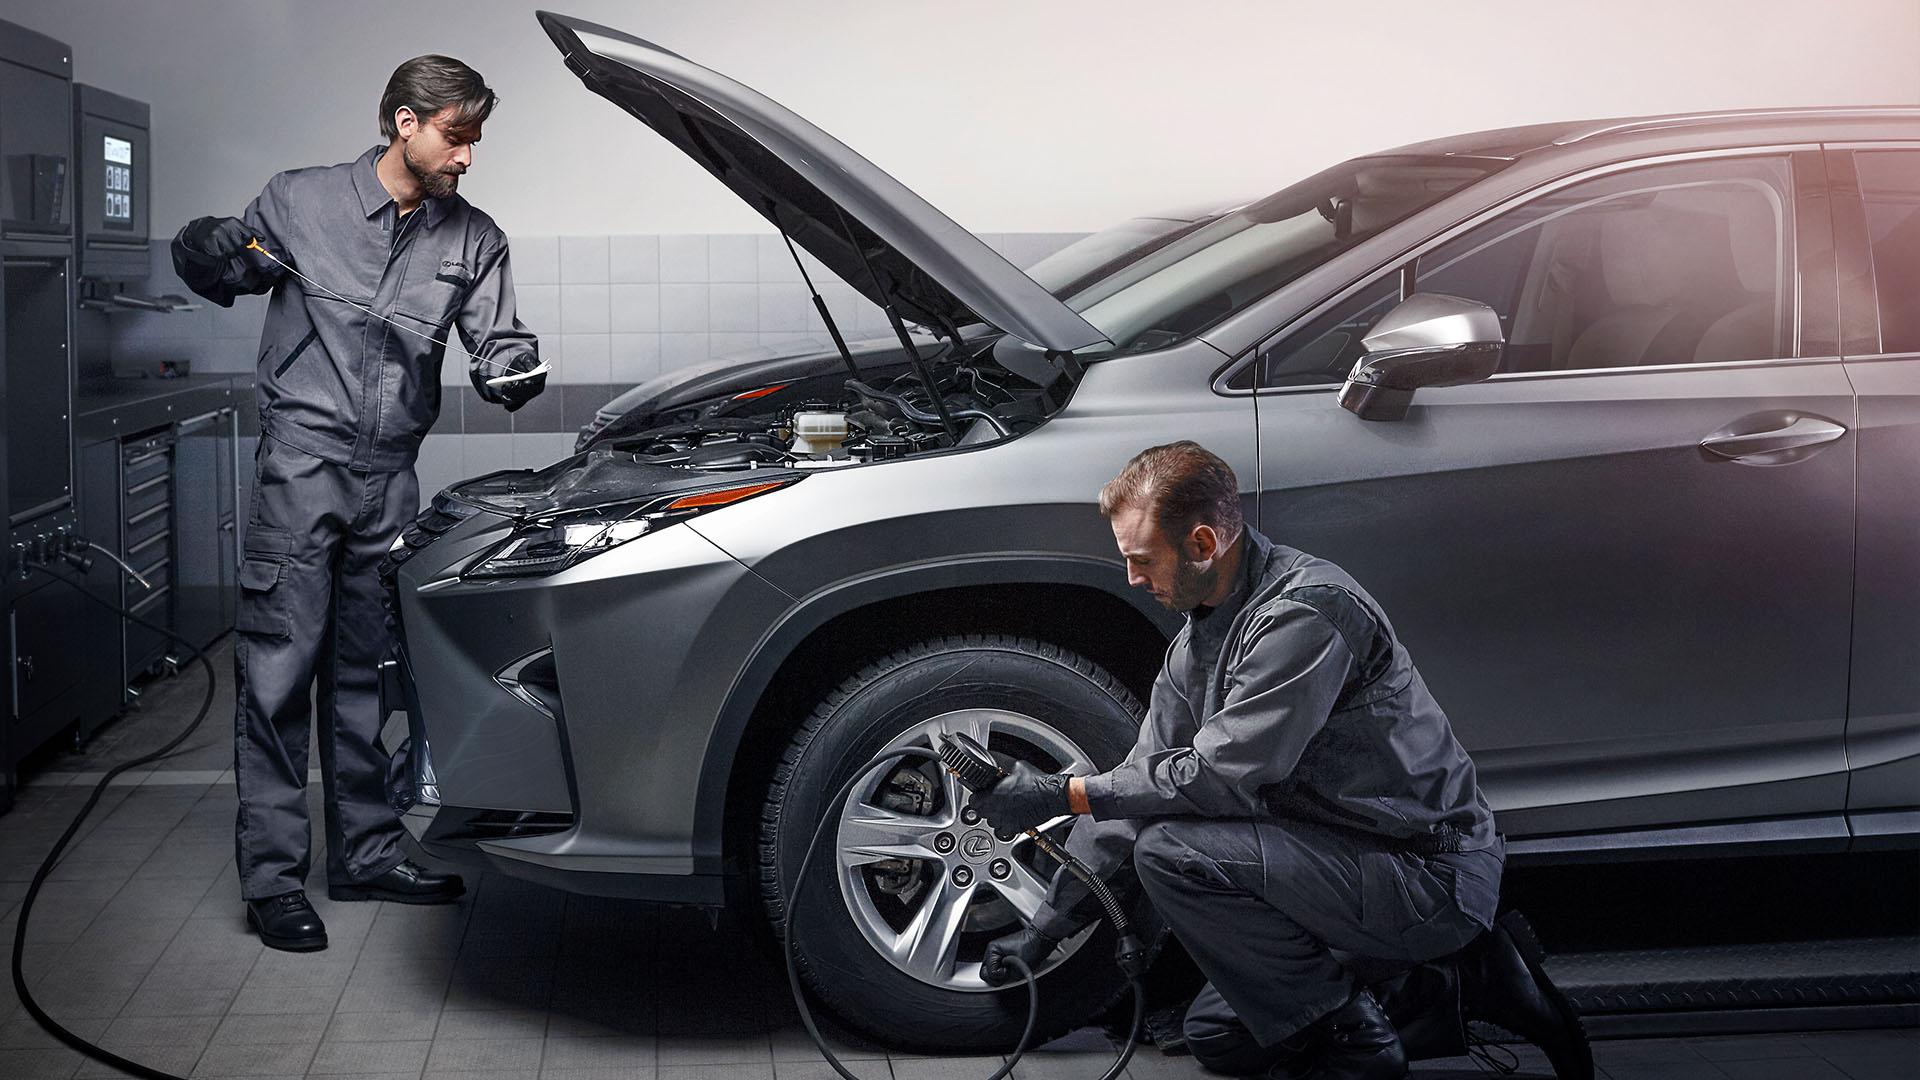 údržba vozidla, poruchové auto, kontrola vozidla, servis, mechanici, sivé auto, servis auta